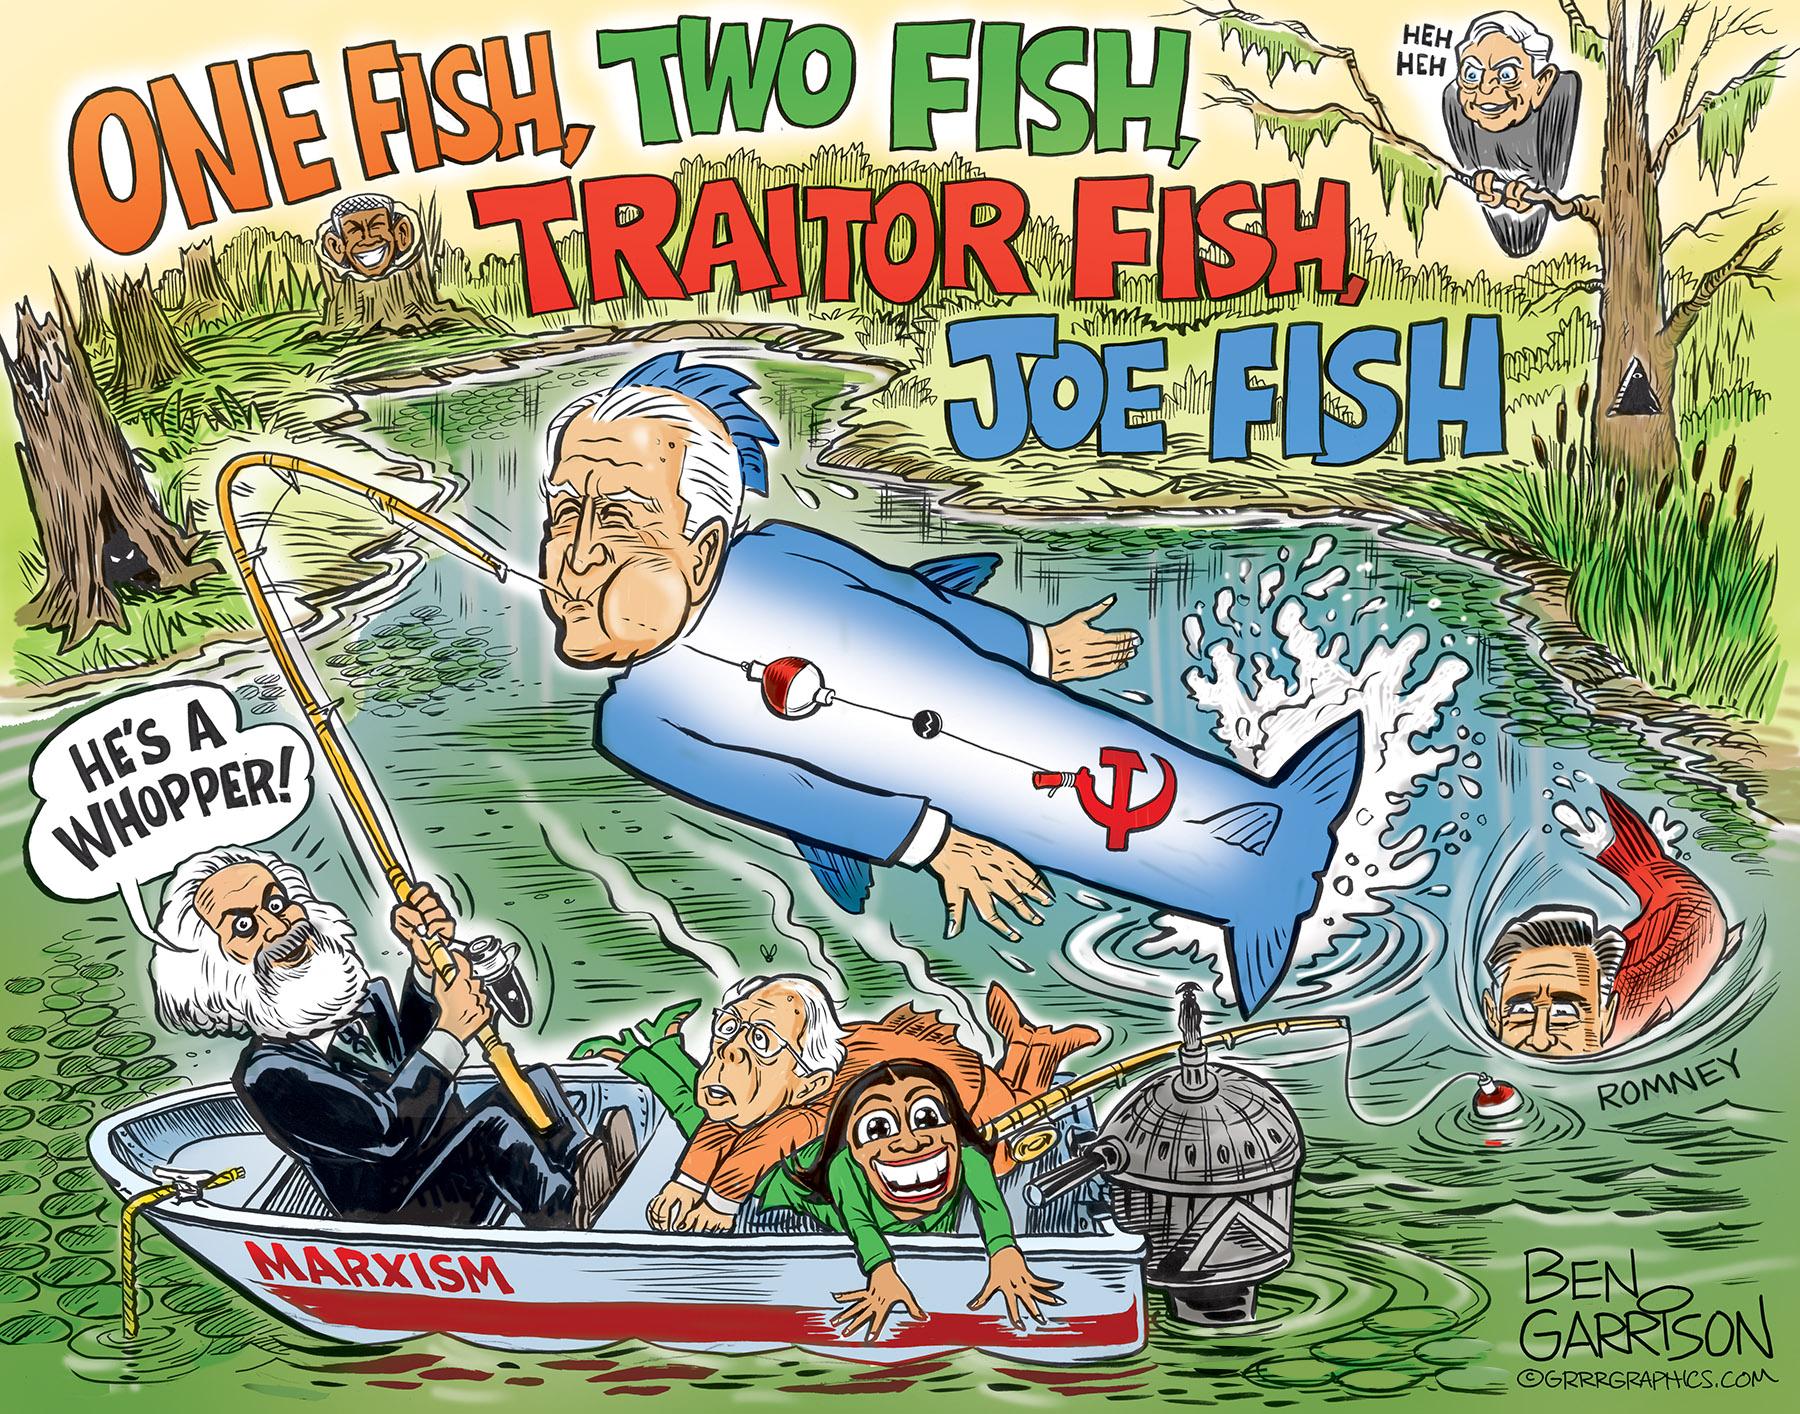 The Marxist Swamp